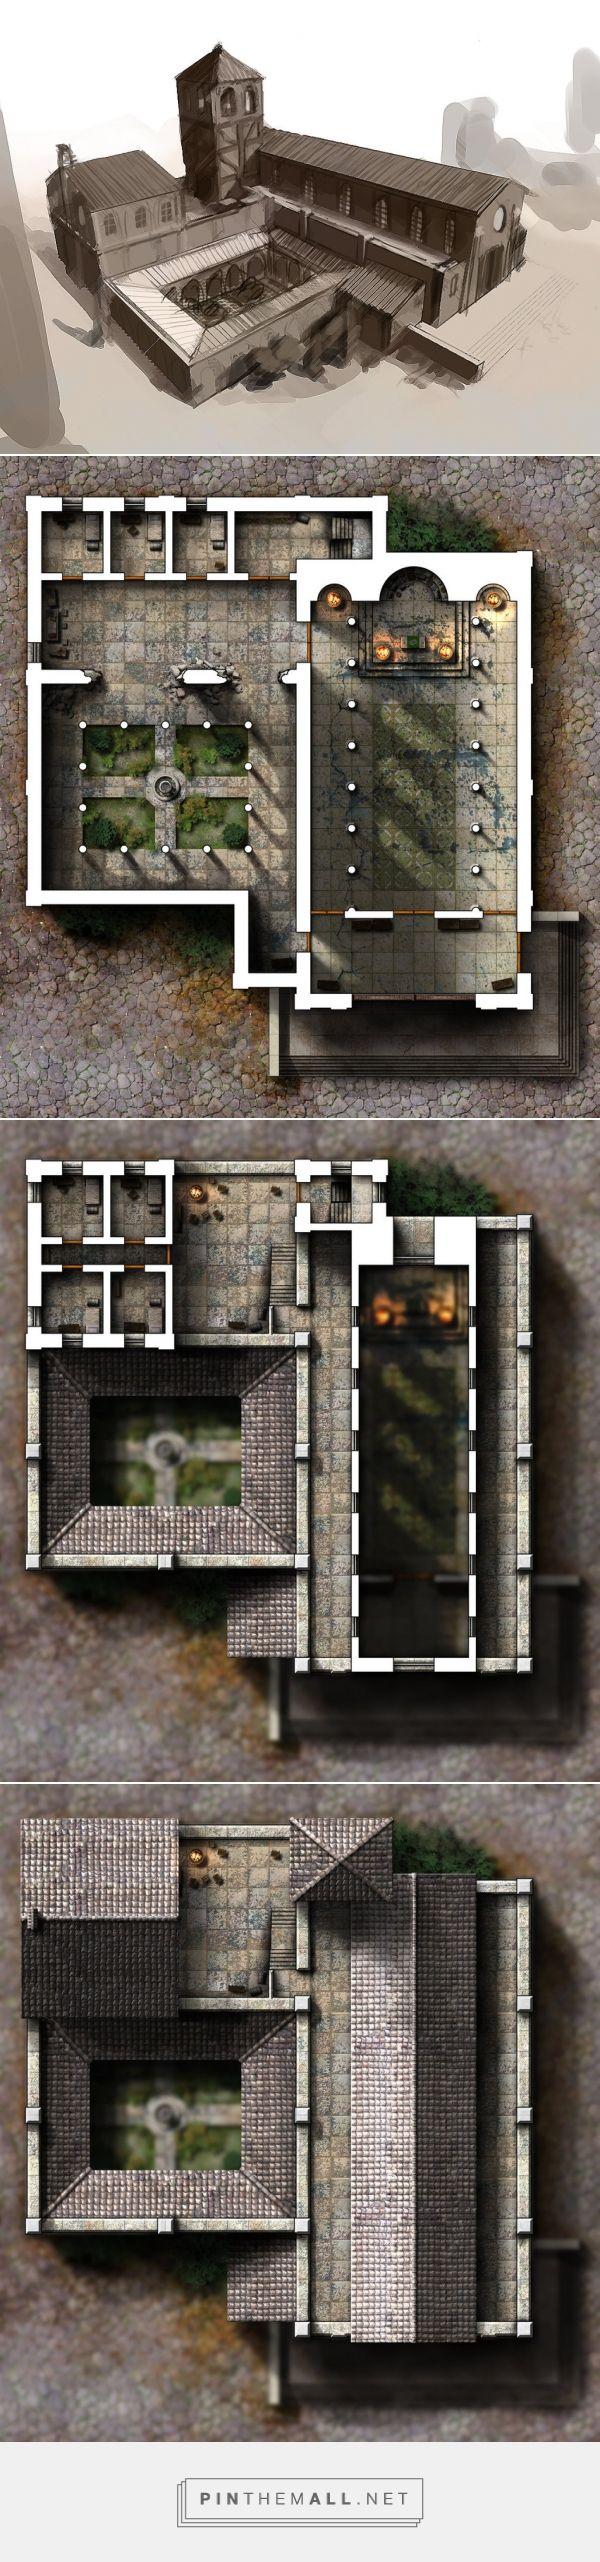 - created via http://pinthemall.net